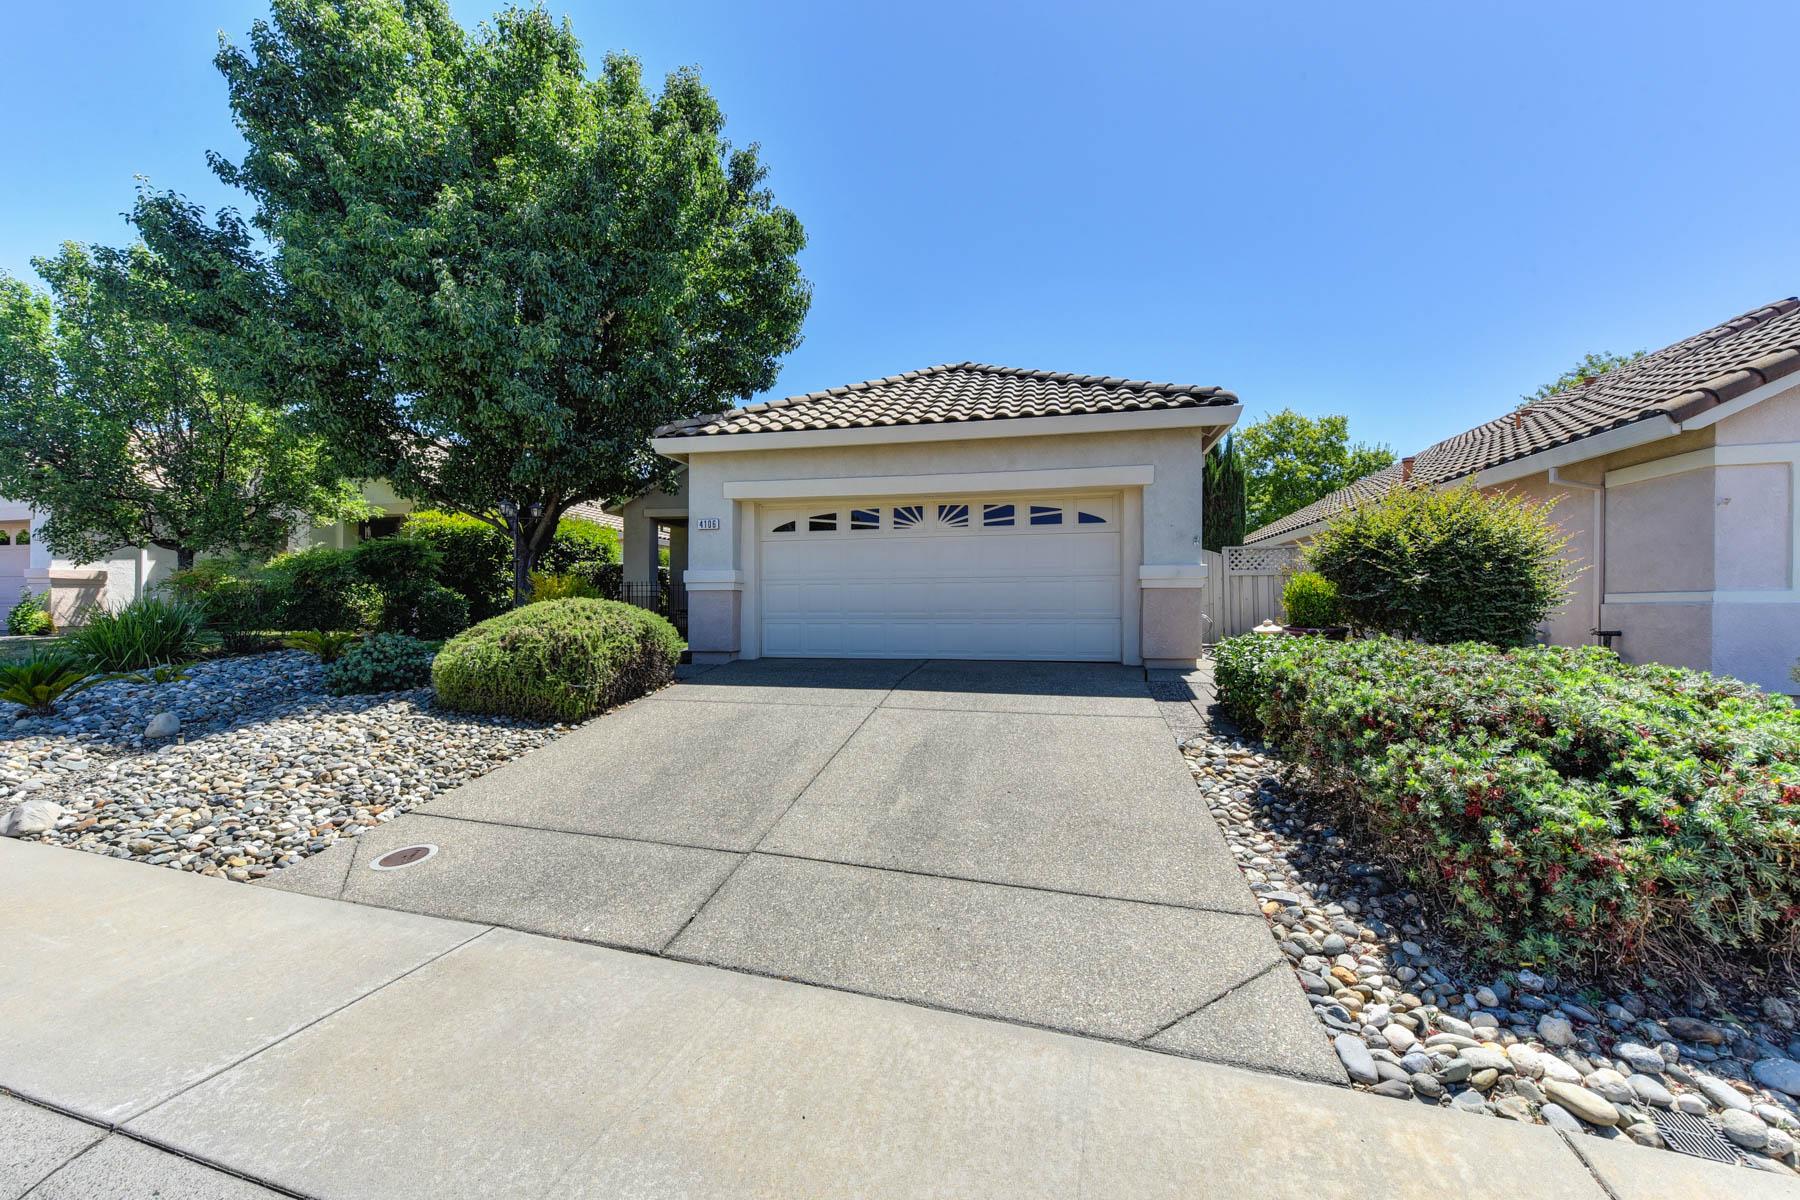 Single Family Homes for Sale at 4106 Sylvan Glenn Ln, Roseville, CA 95747 4106 Sylvan Glenn Ln Roseville, California 95747 United States